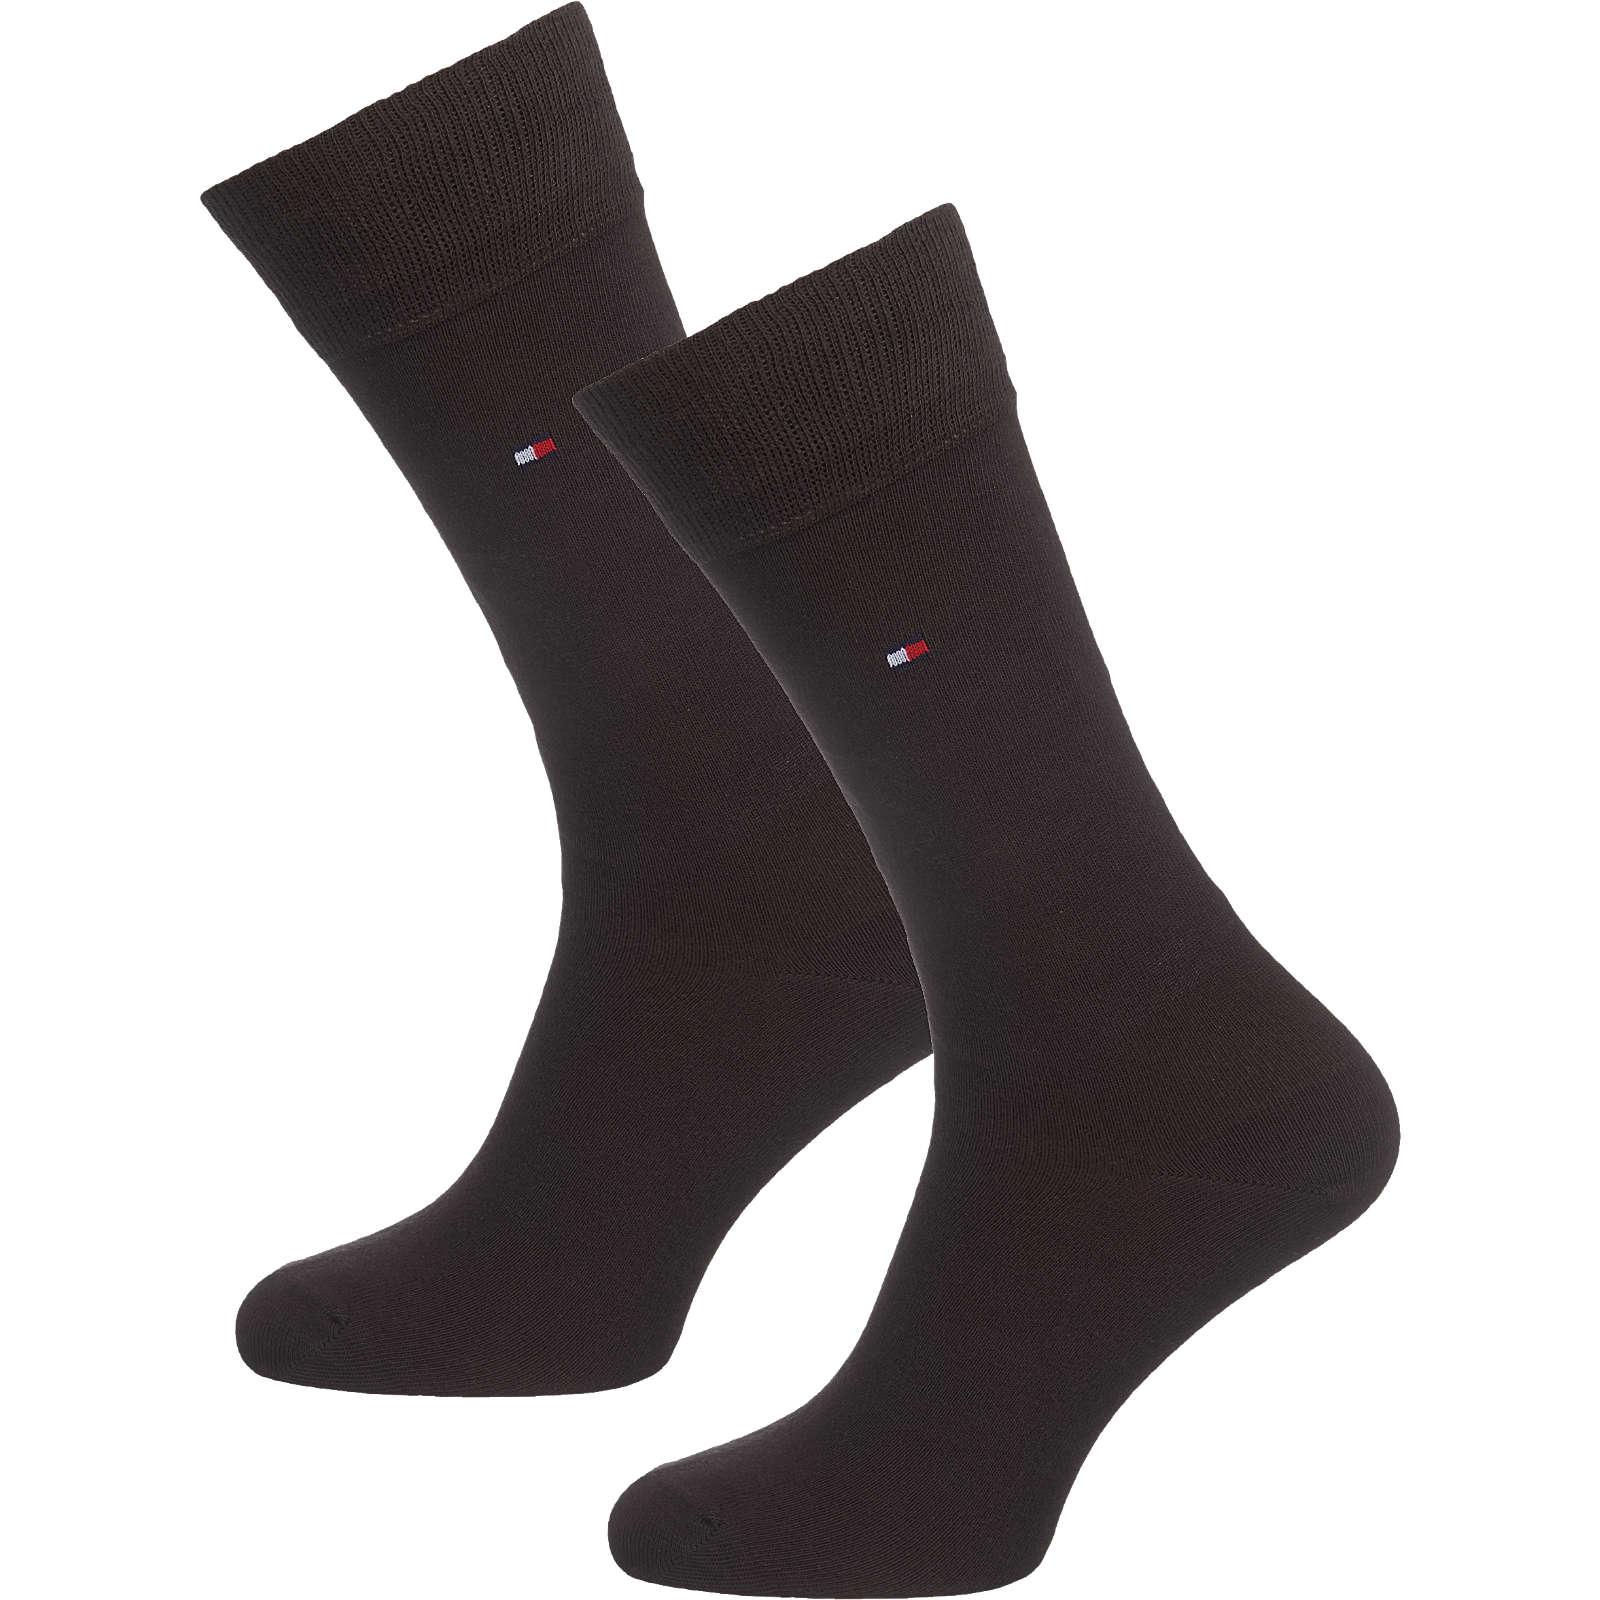 TOMMY HILFIGER 2 Paar Socken dunkelbraun Herren Gr. 43-46